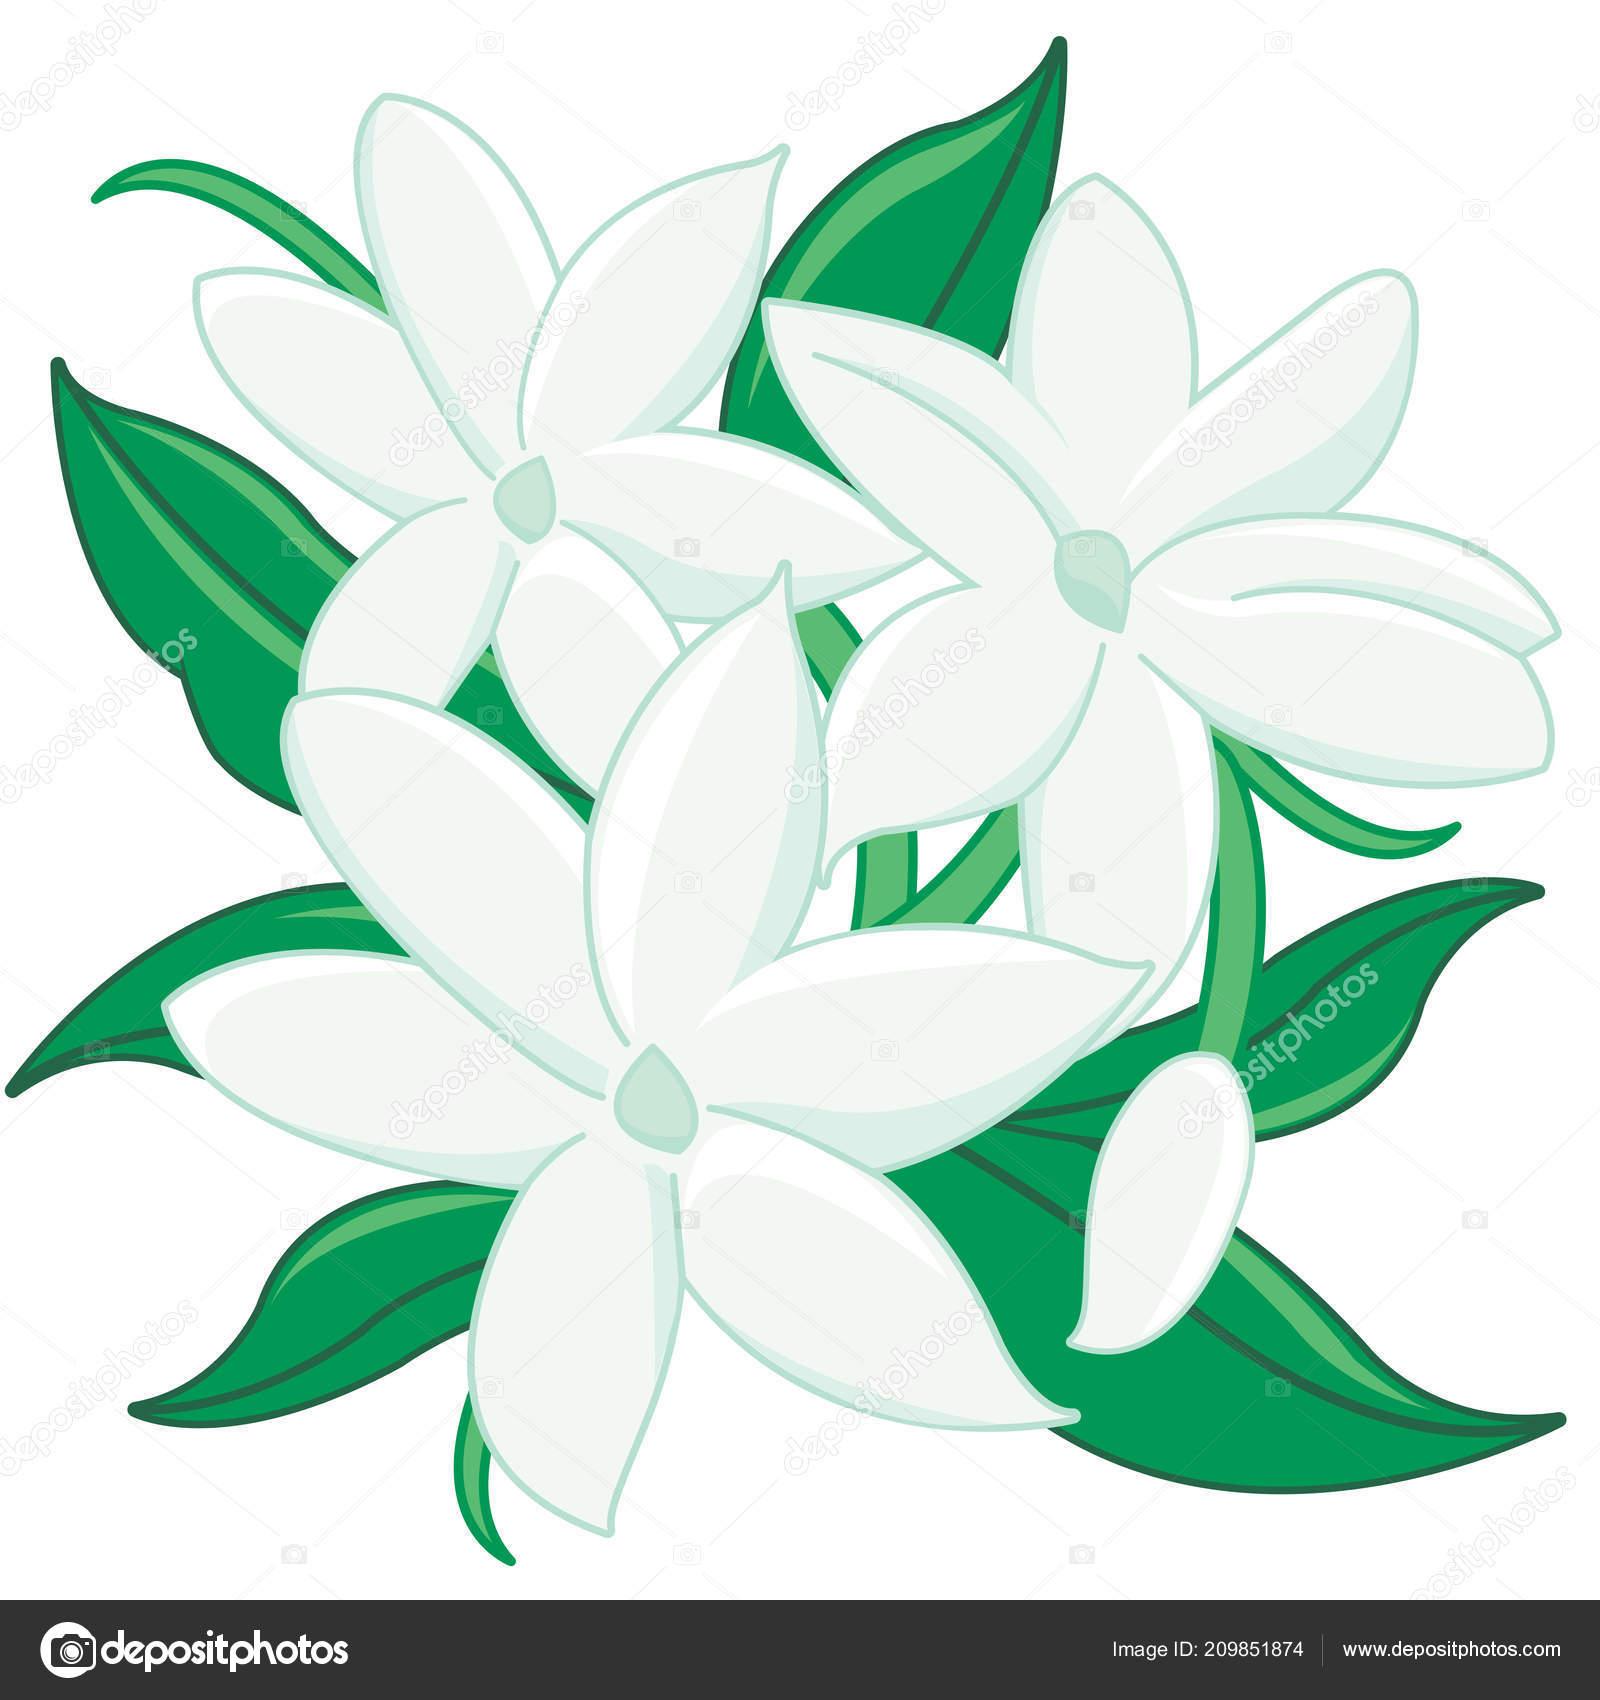 Vector Illustration Jasmine Flowers Leaves Stock Vector